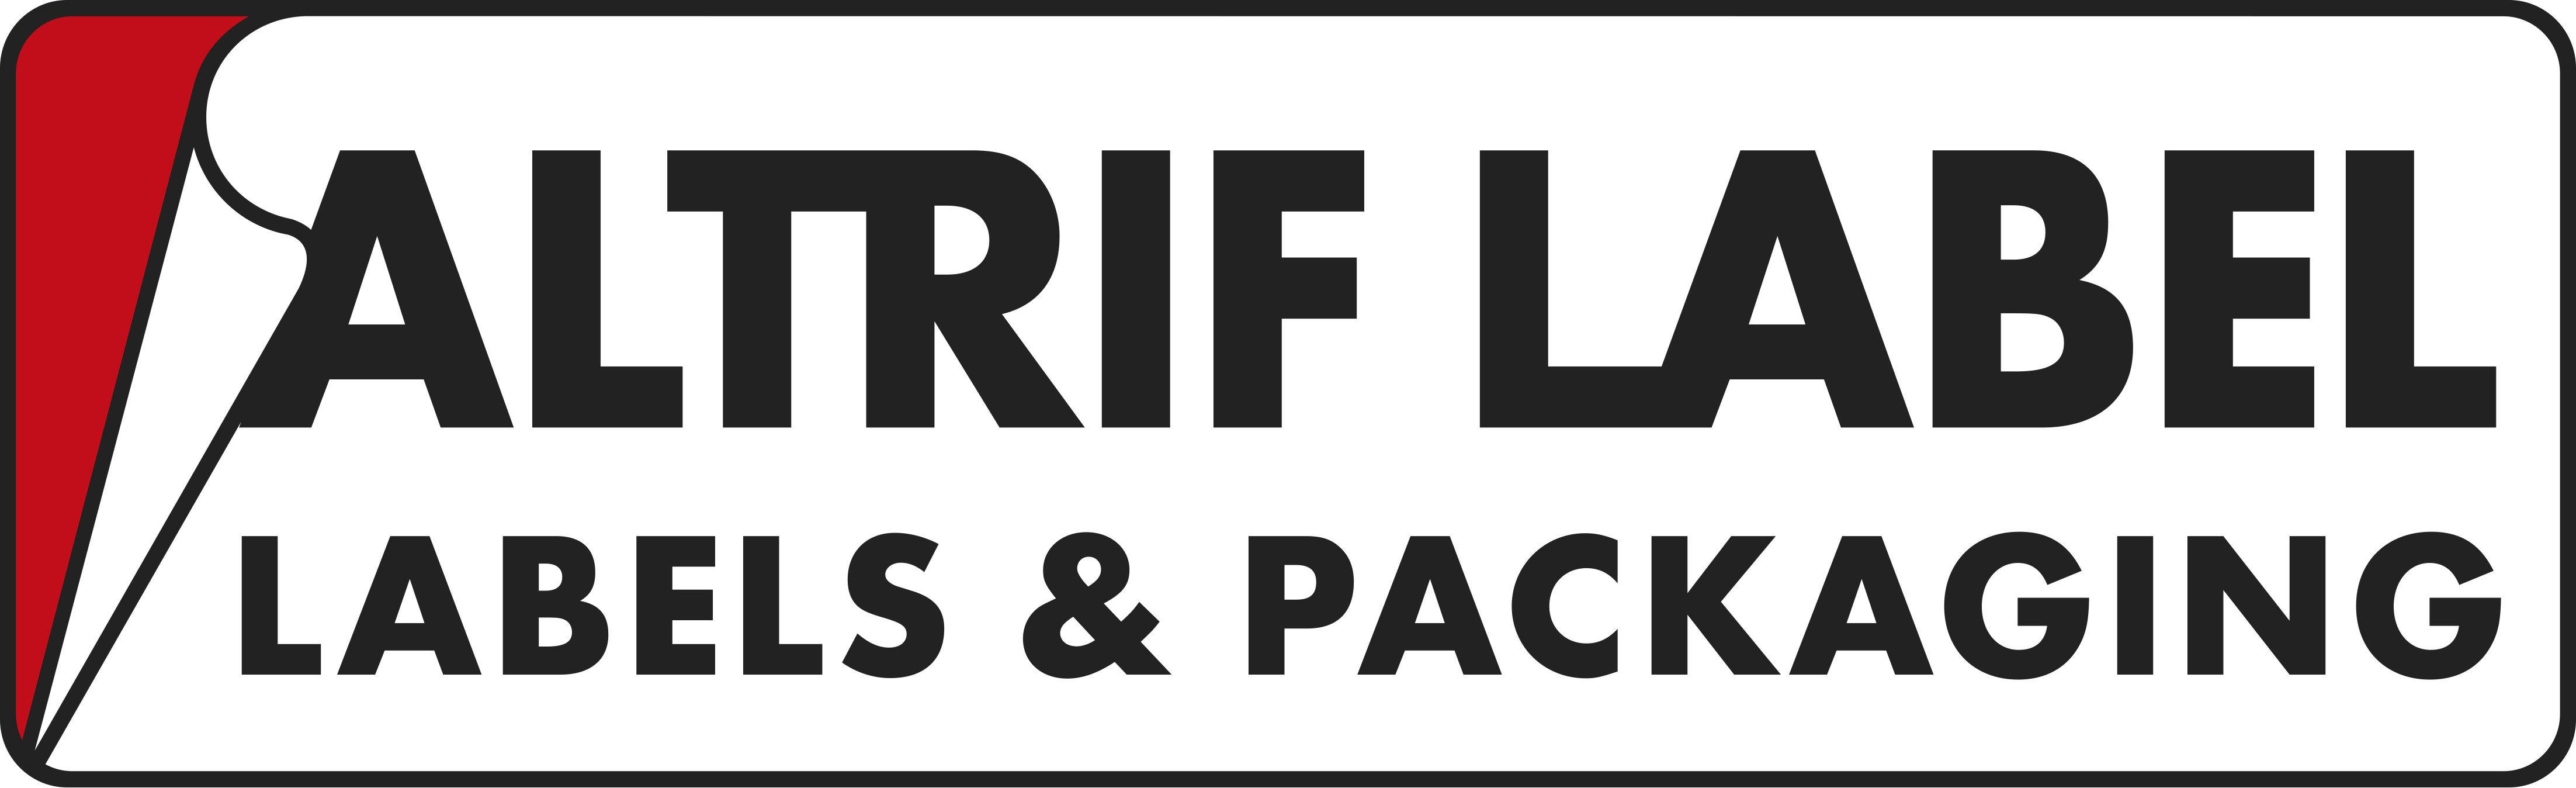 altrif_logo-2.jpg